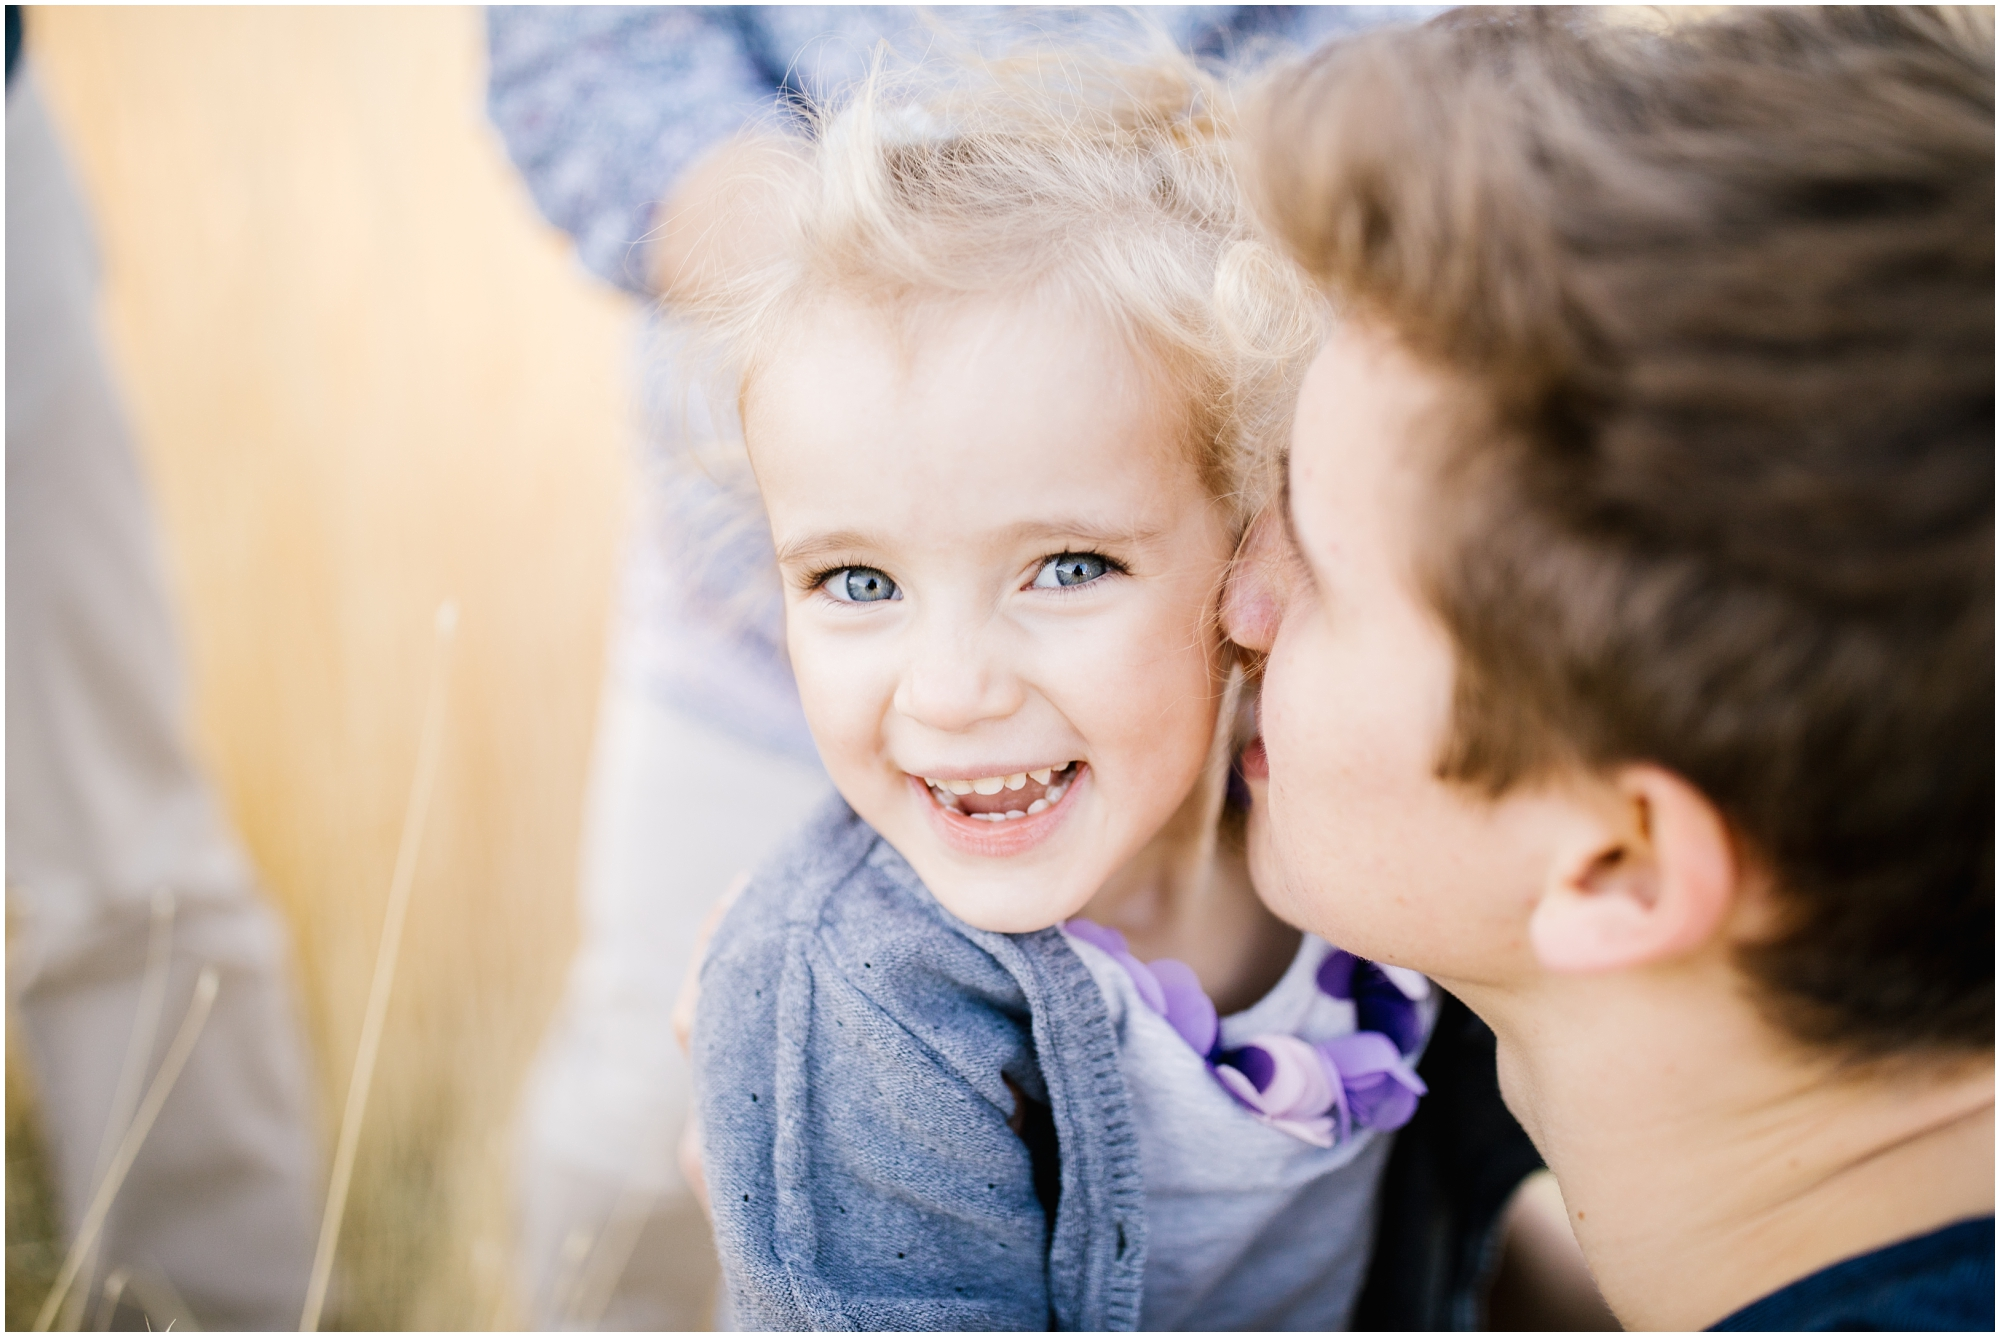 Jaursch-96_Lizzie-B-Imagery-Utah-Family-Photographer-Park-City-Salt-Lake-City-Herriman-Utah.jpg